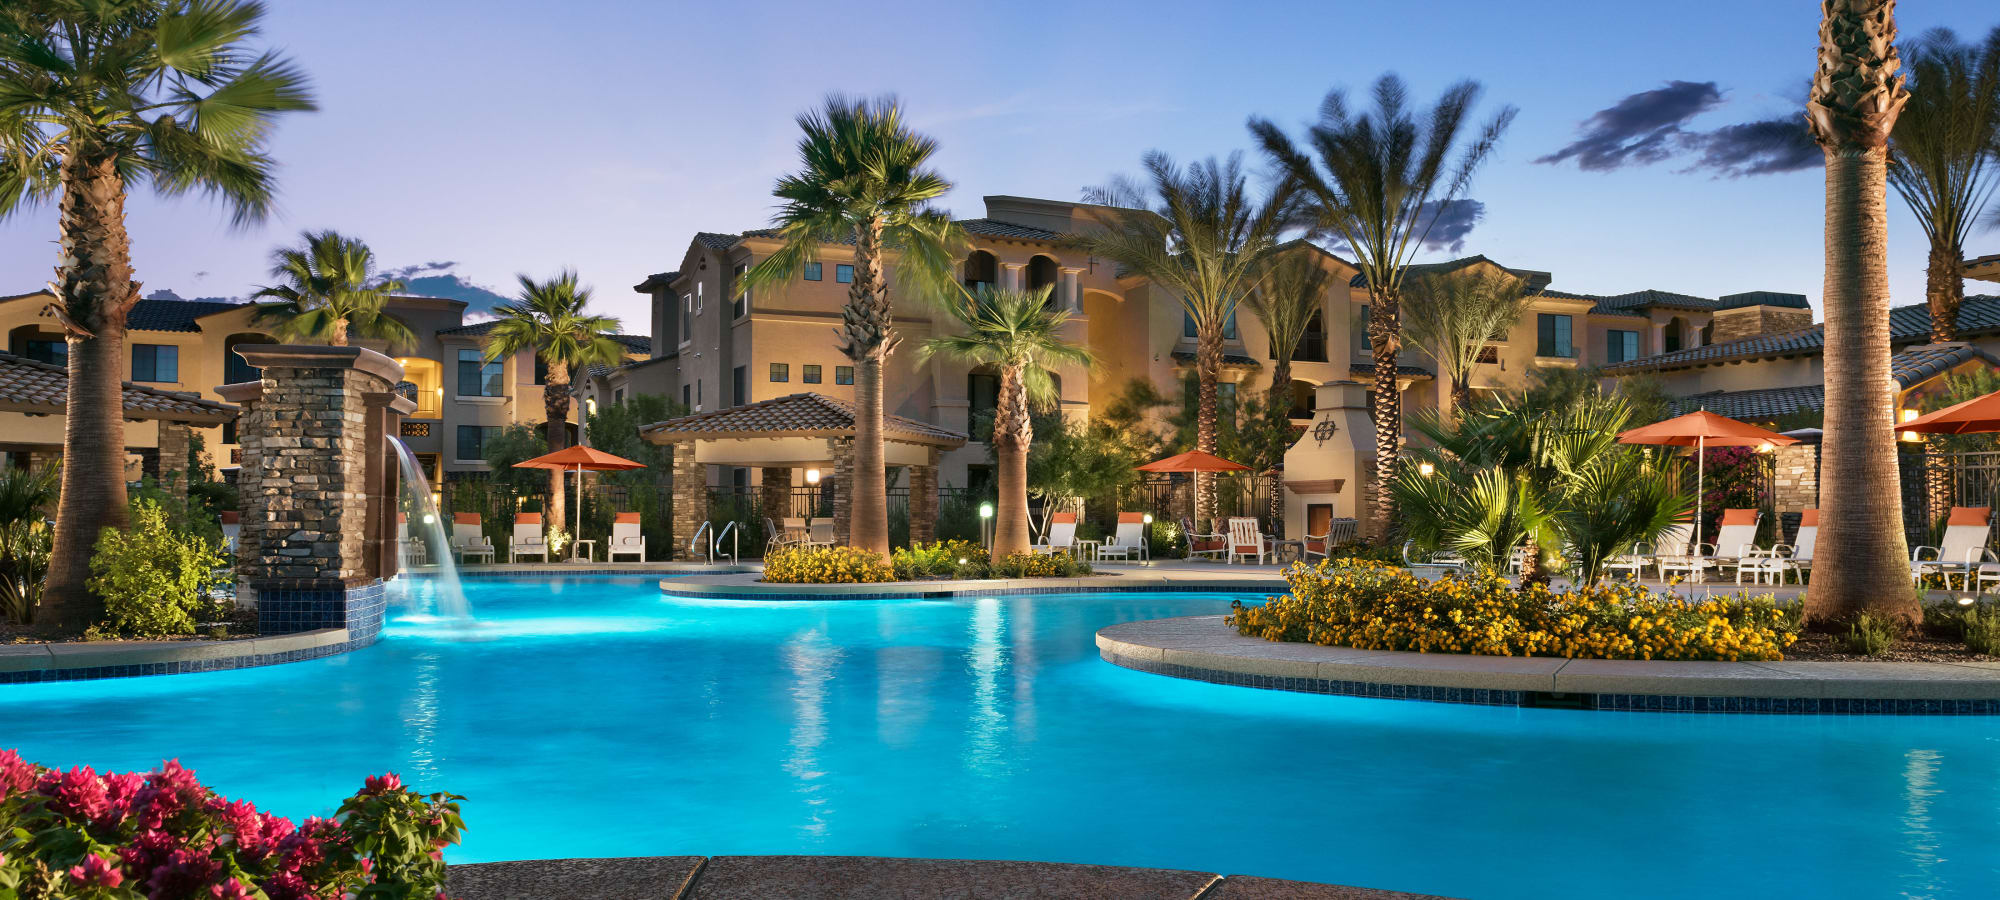 Luxurious swimming pool area at San Milan in Phoenix, Arizona